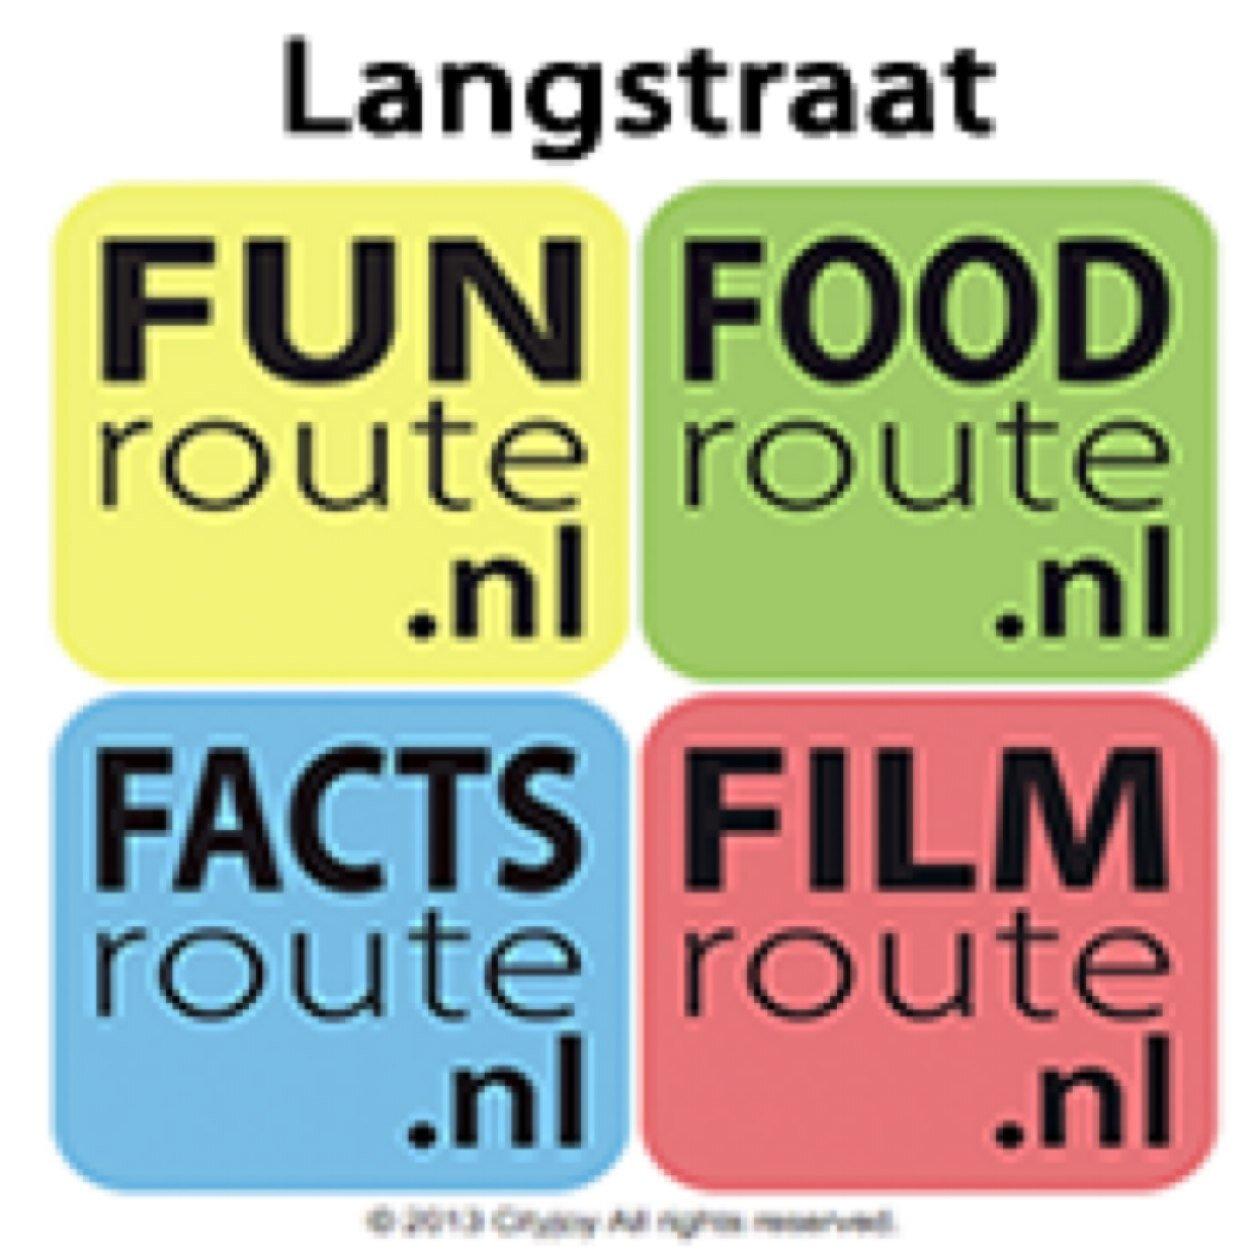 @cjlangstraat